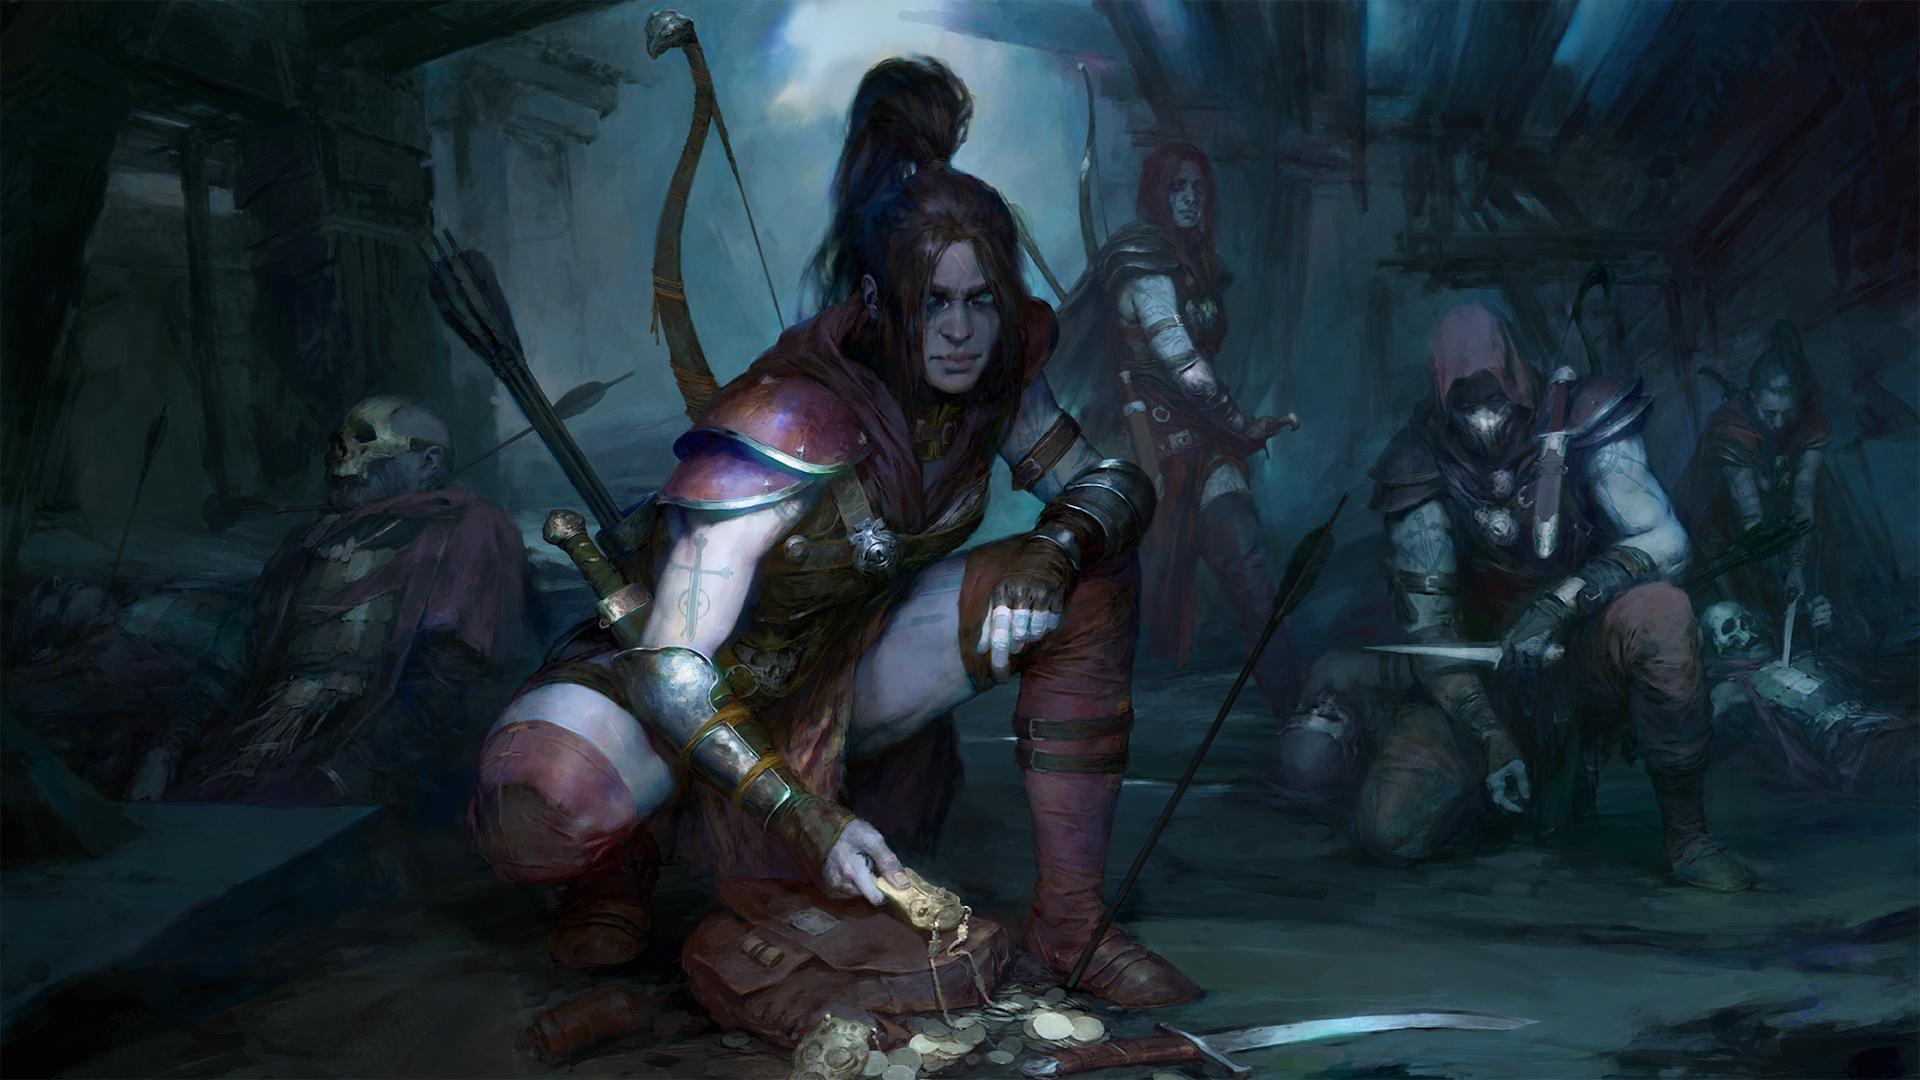 Diablo 4 will include a Rogue class